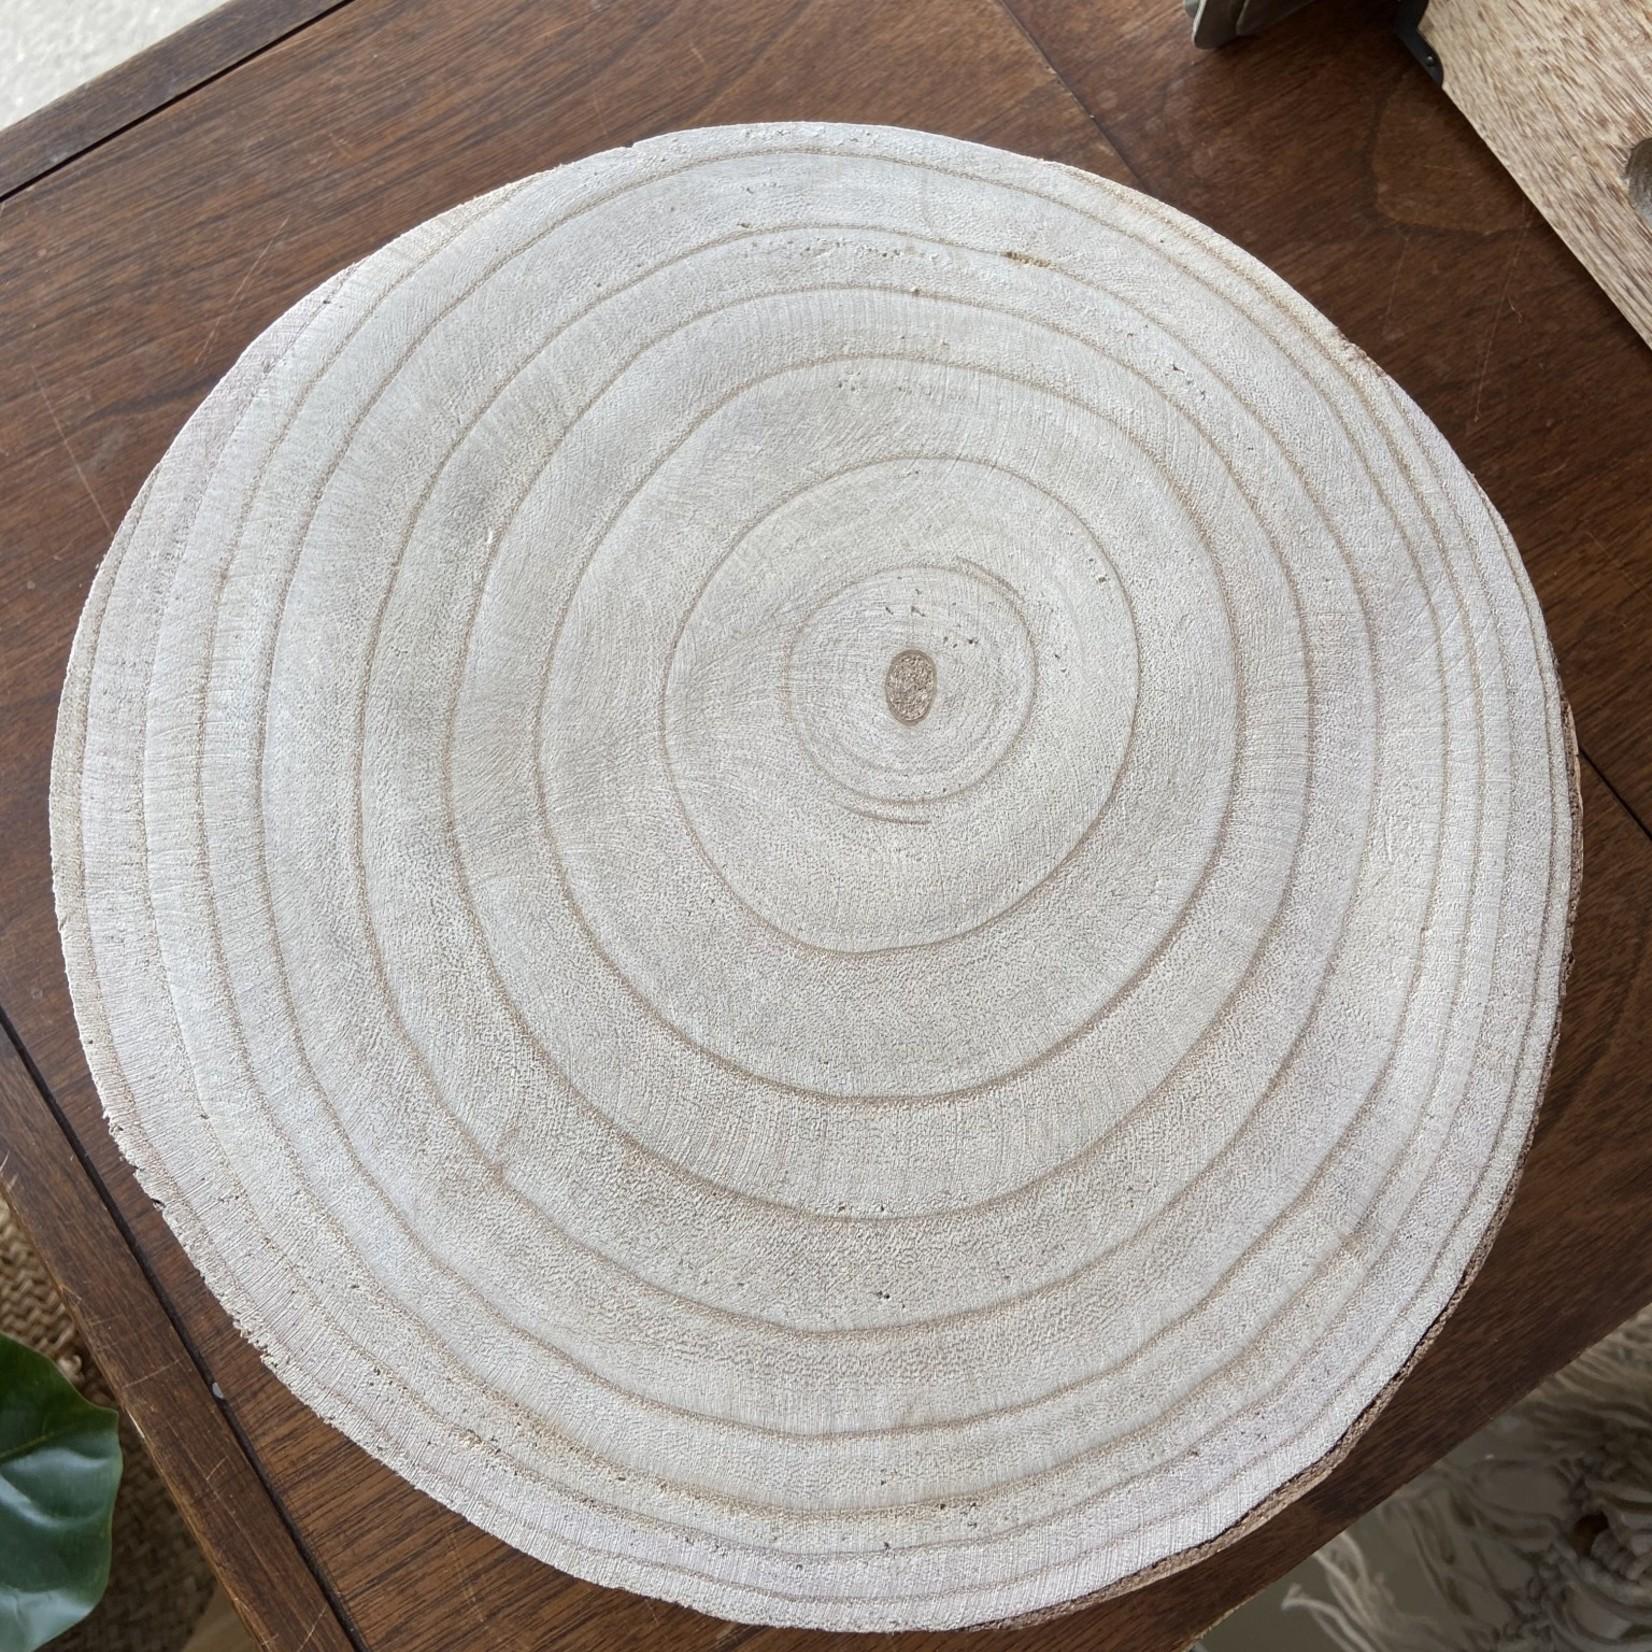 Santa Barbara Designs Wood Riser Medium